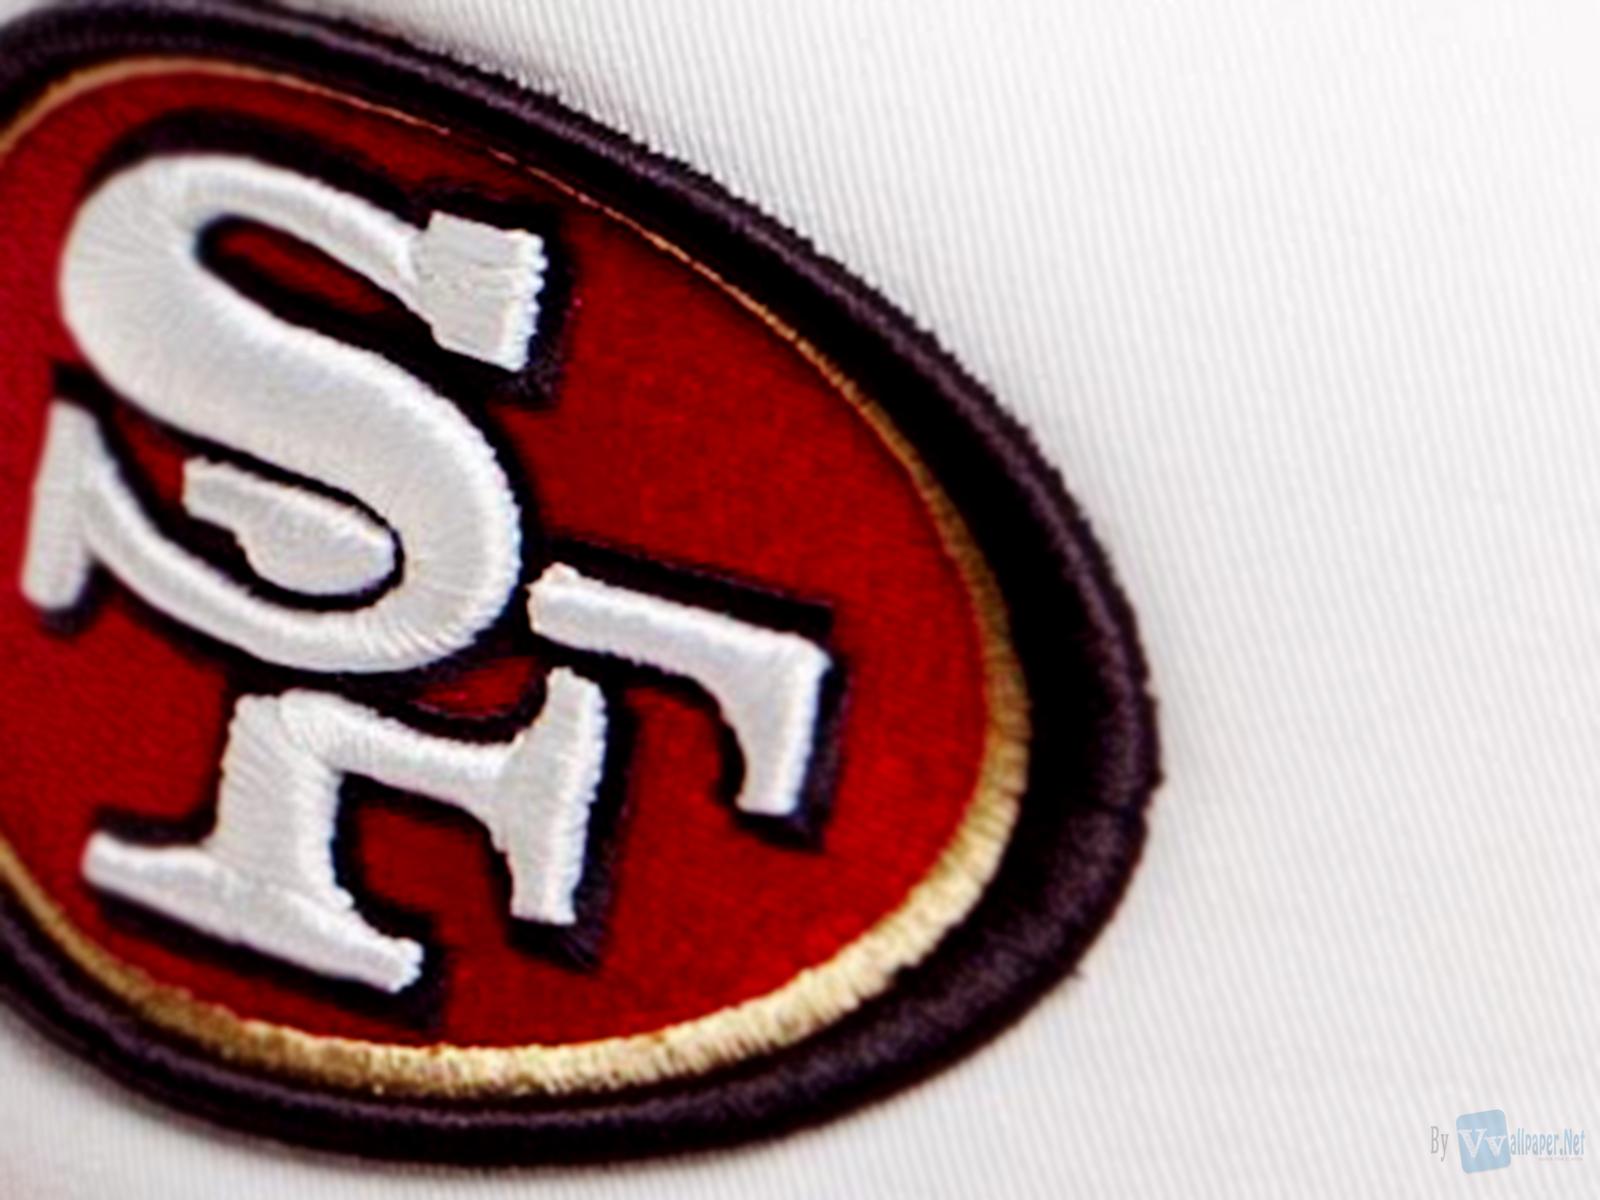 Wallpaper Views San Francisco 49ers Nfl Team HD Wallpapers 1600x1200